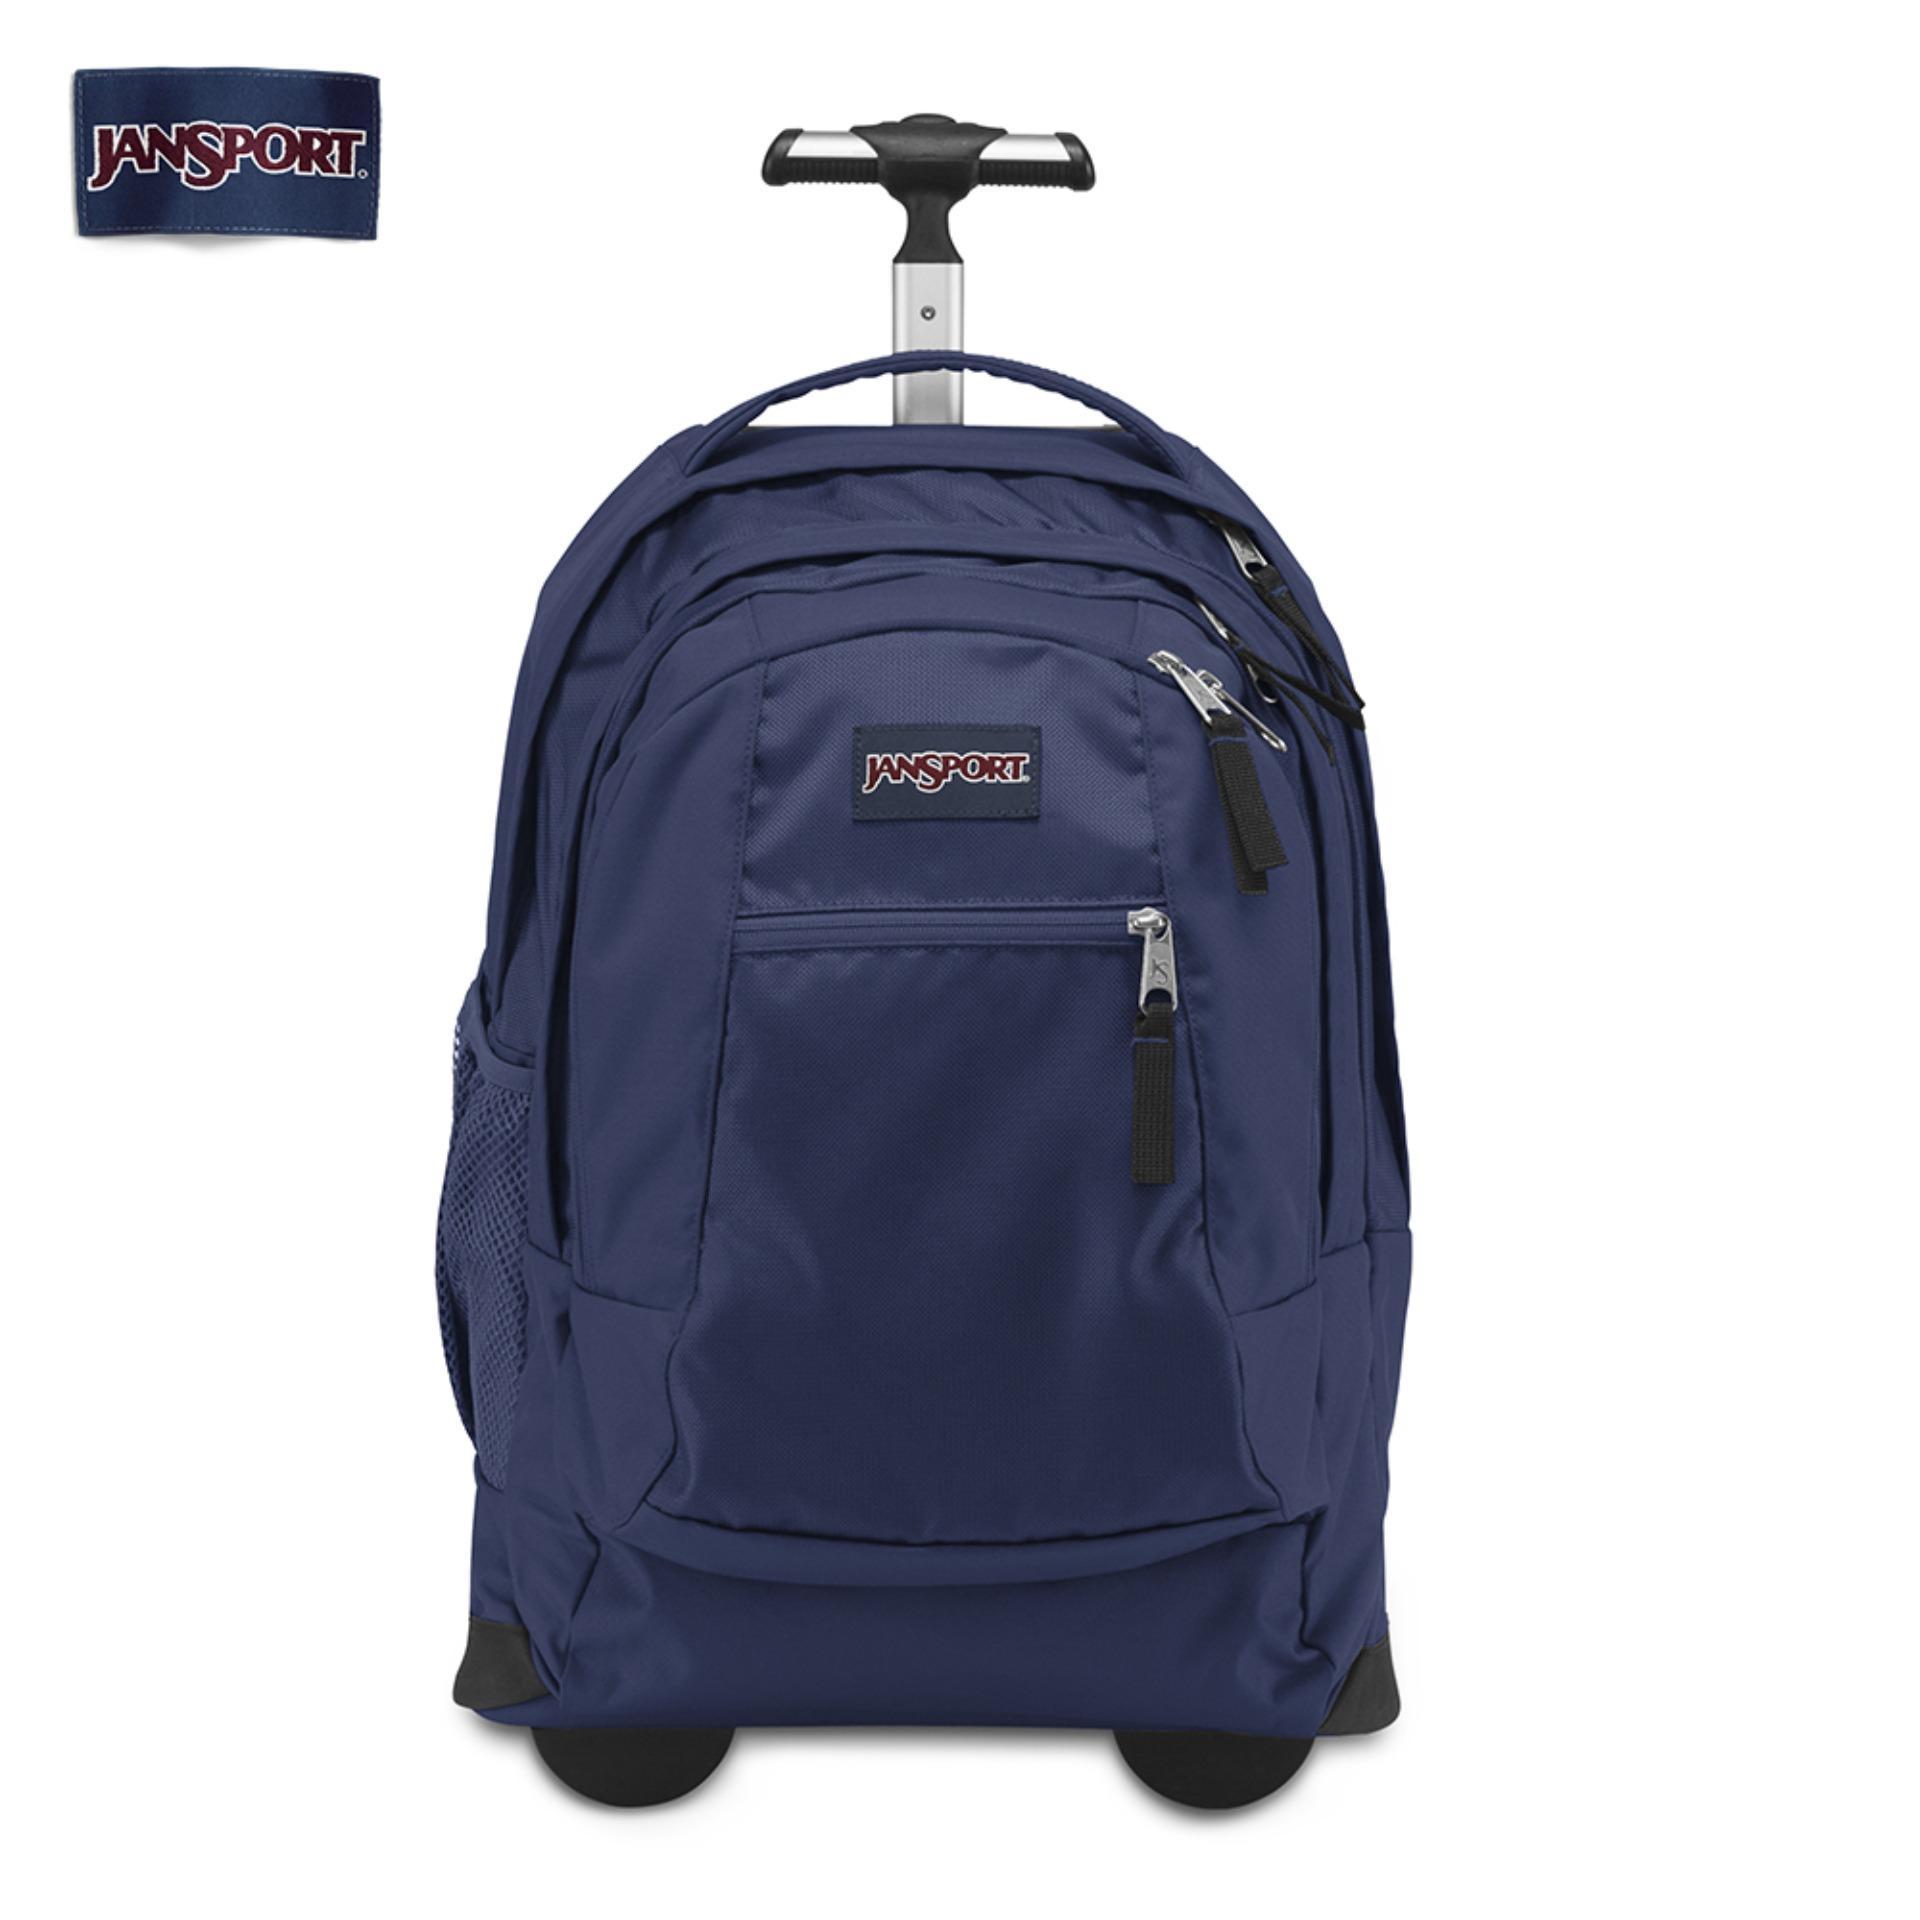 Jansport Unisex DRIVER 8 600 DENIER POLYESTER Backpack Trolley d55c0d5437166